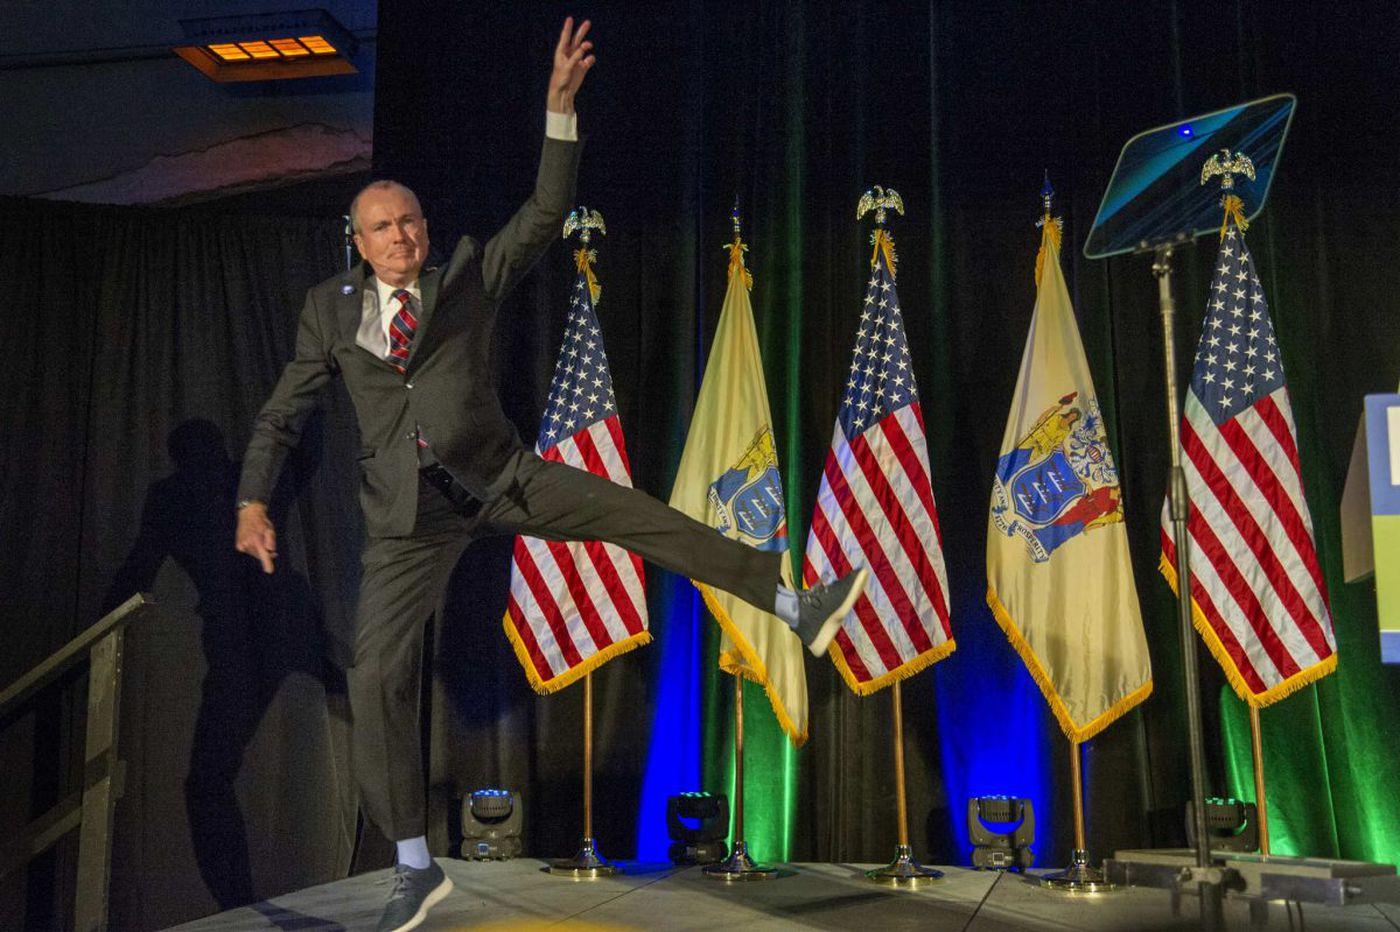 N.J. Democrat Phil Murphy, former Wall Street banker, elected to succeed Chris Christie